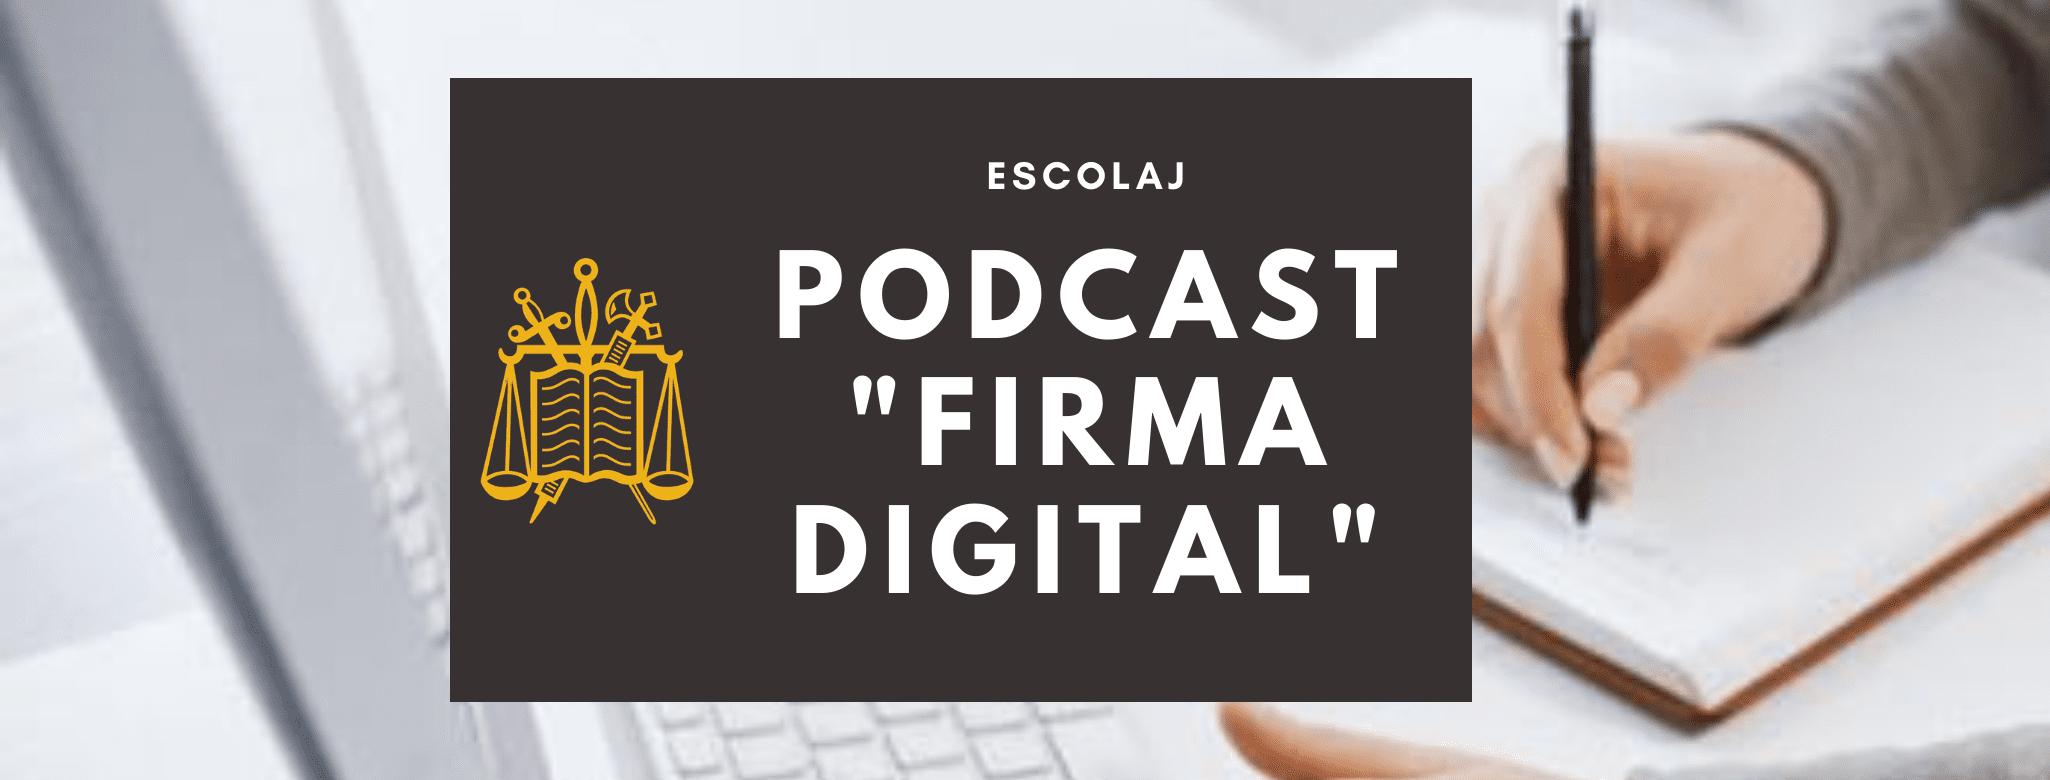 Podcast ESCOLAJ pdf y la fi